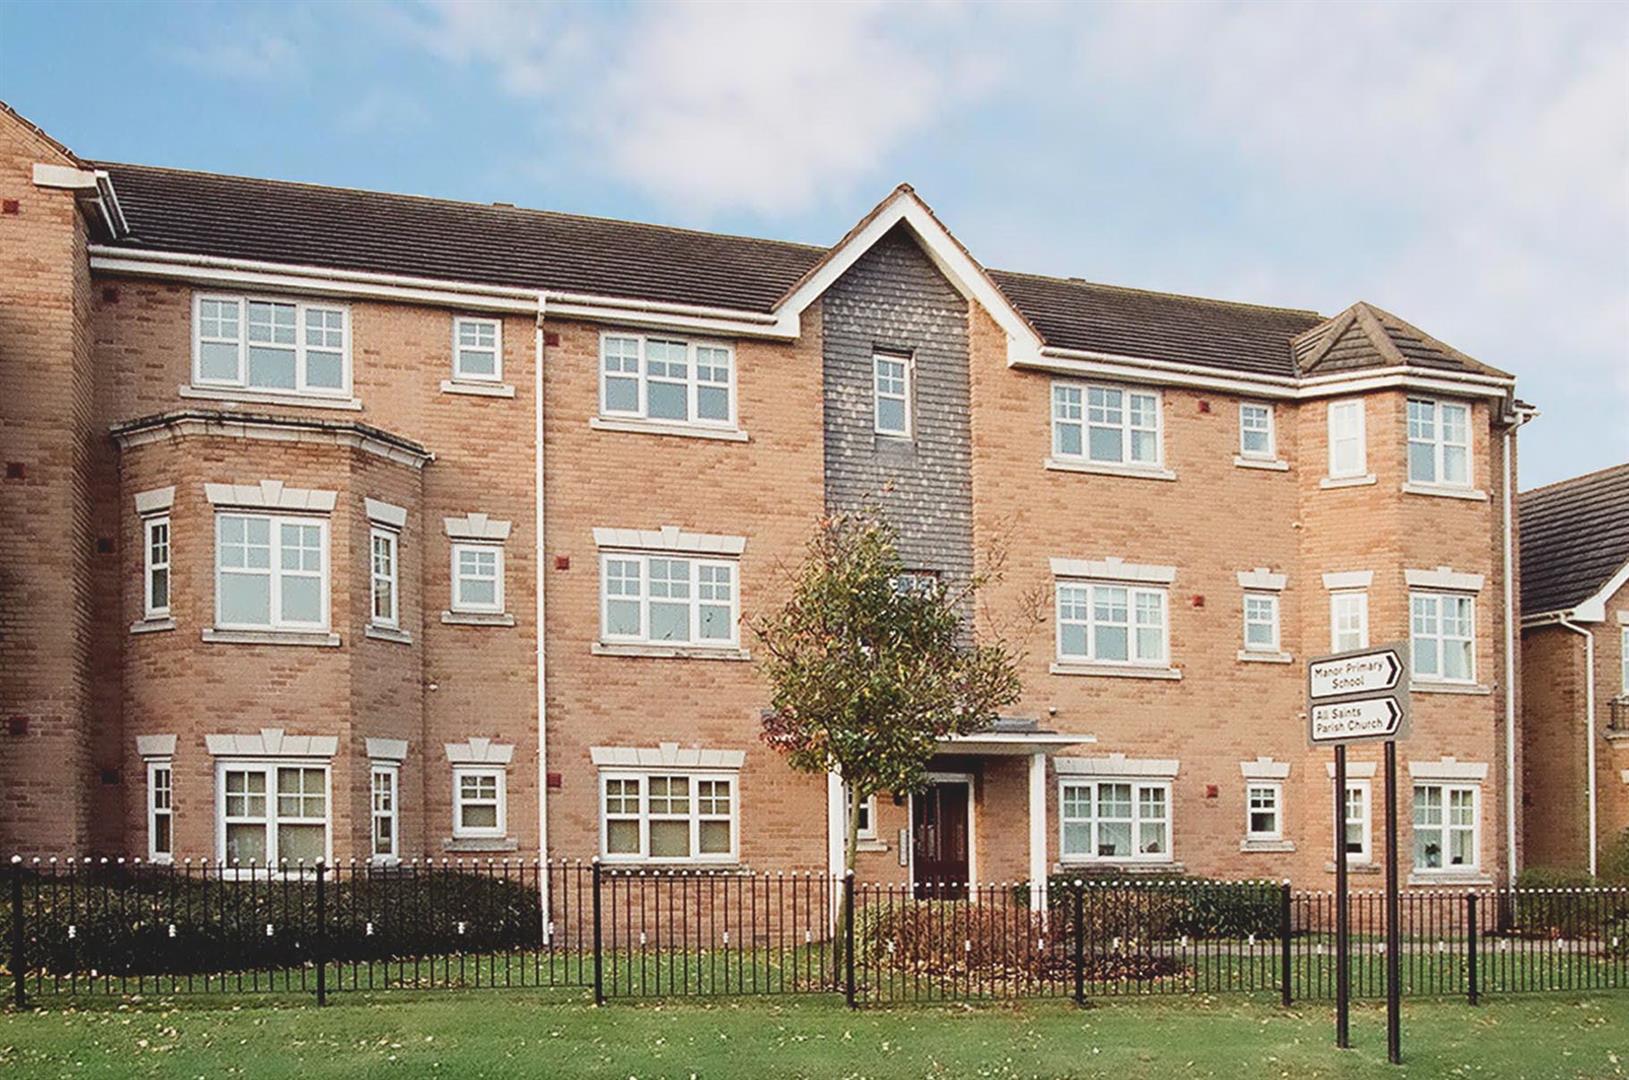 Foley Court, Sutton Coldfield